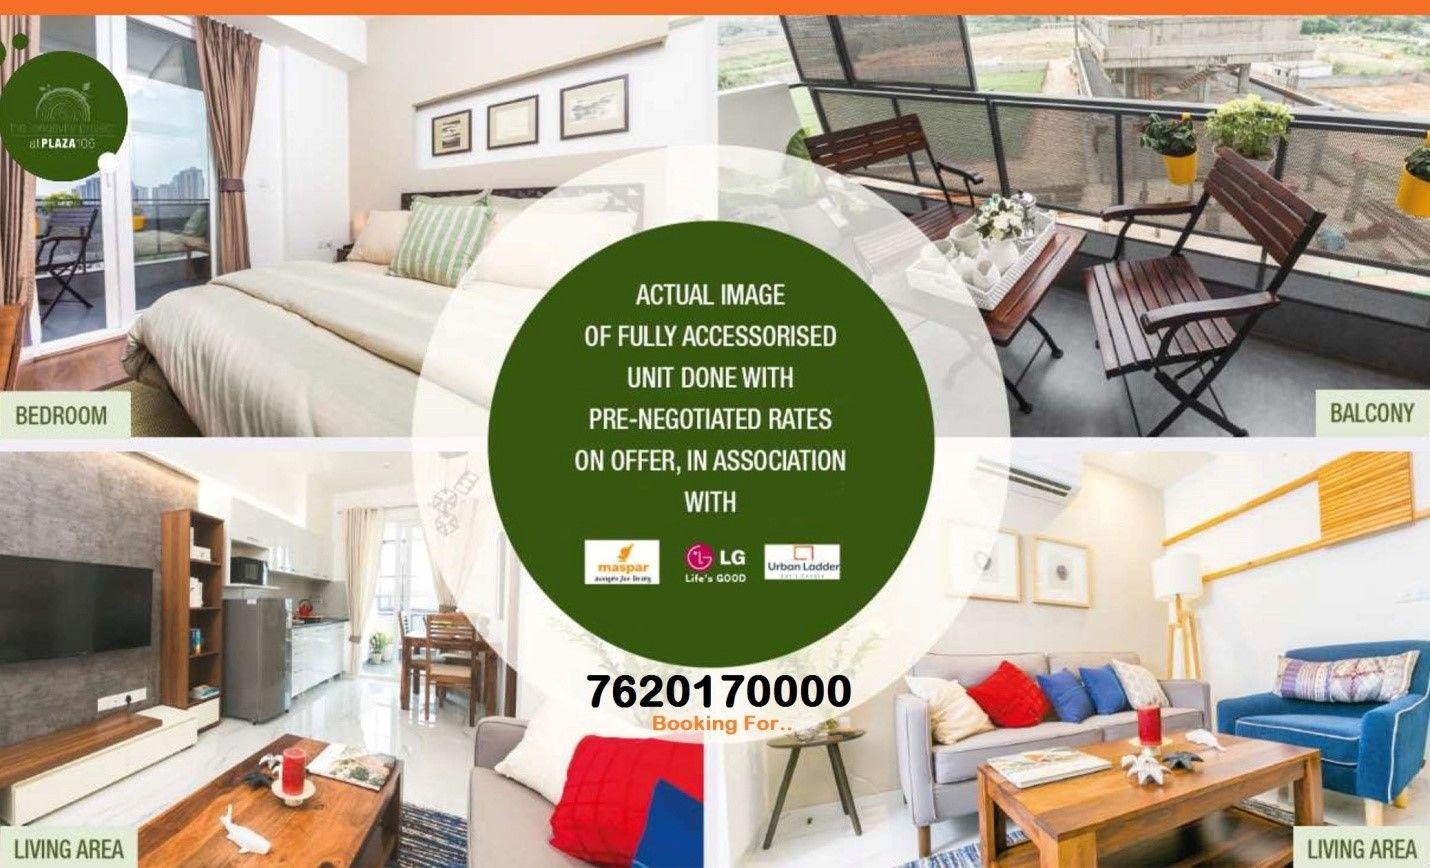 Plaza 106 Studio Apartments Gurgaon